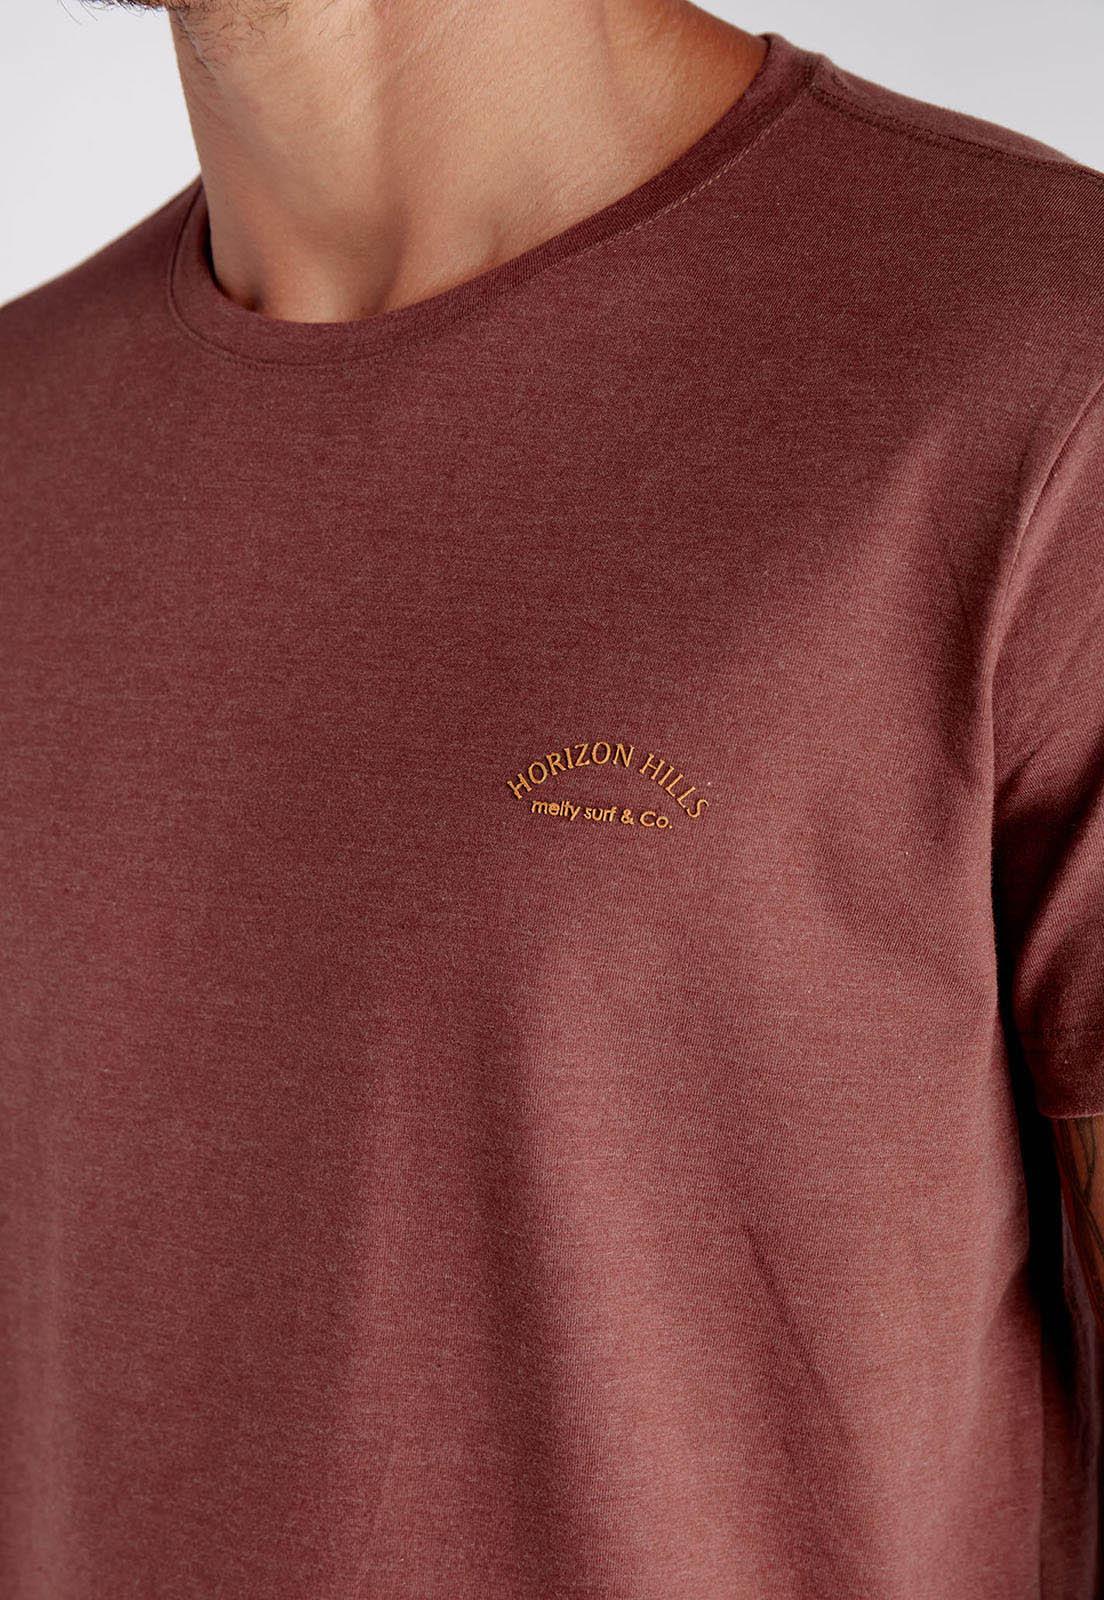 T-shirt Horizon Hills Melty